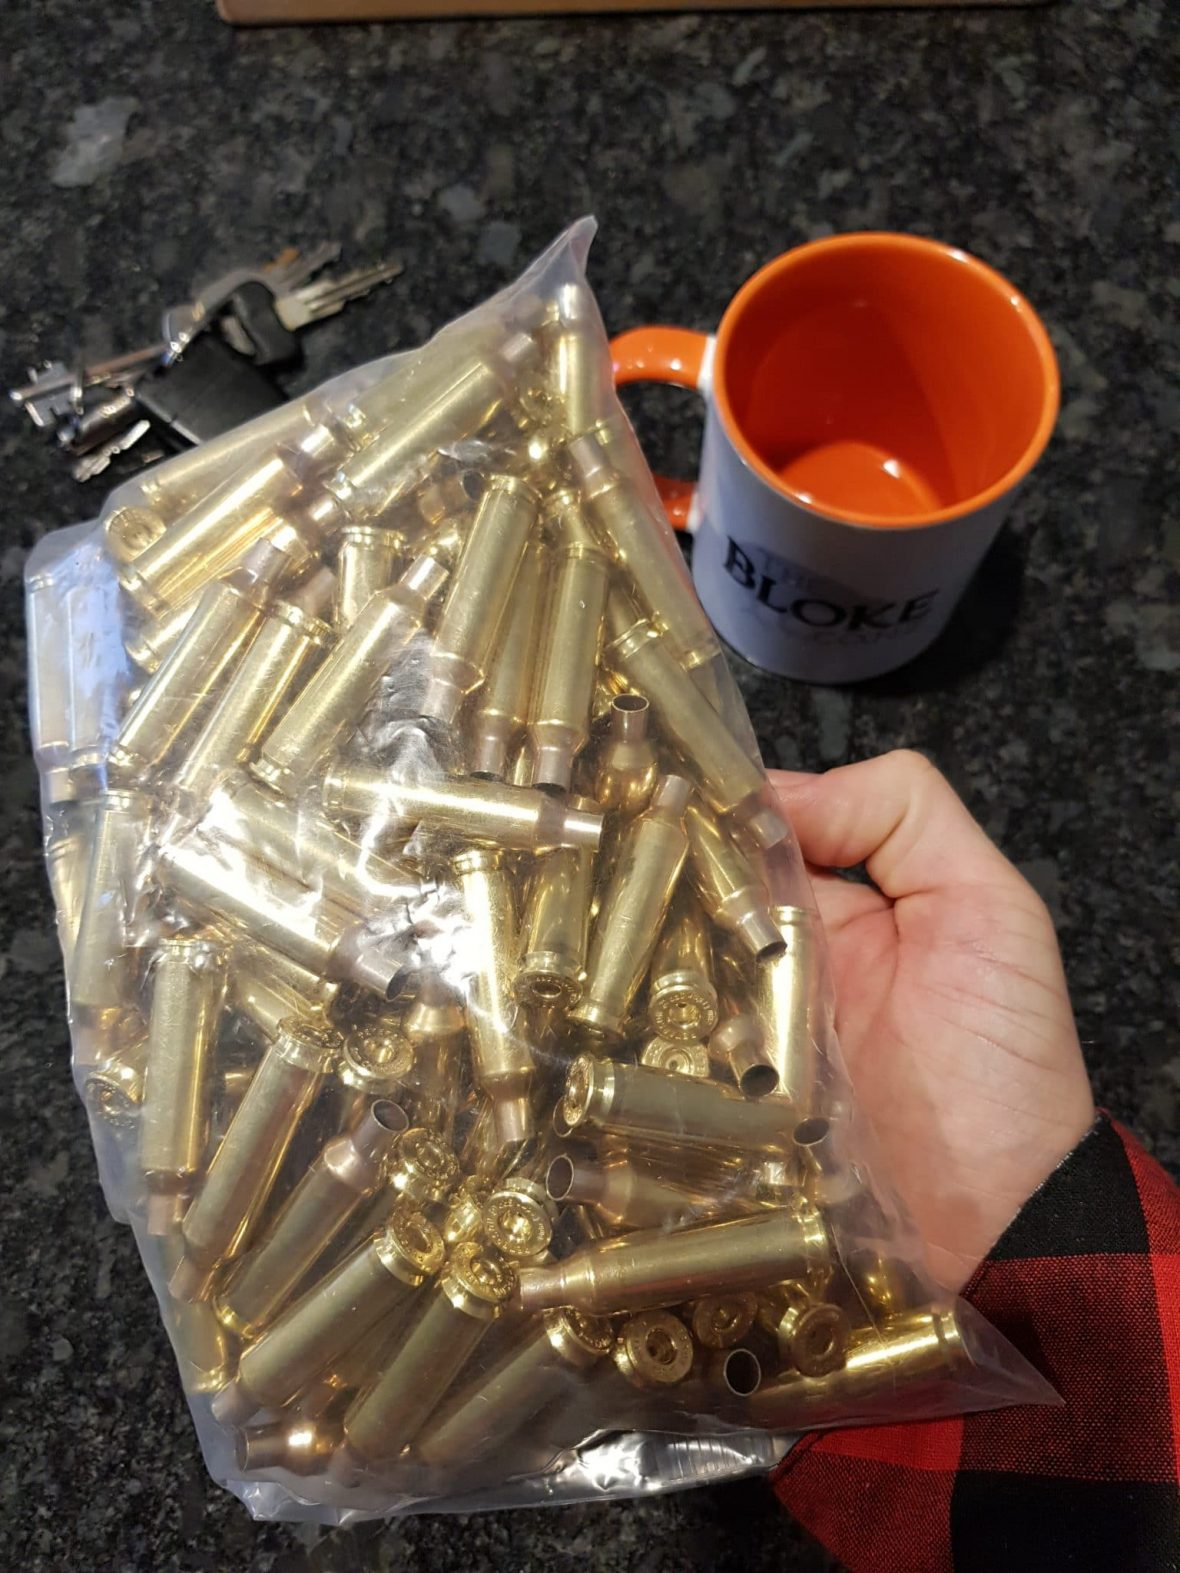 6mm Creedmoor Small Primer Peterson Brass